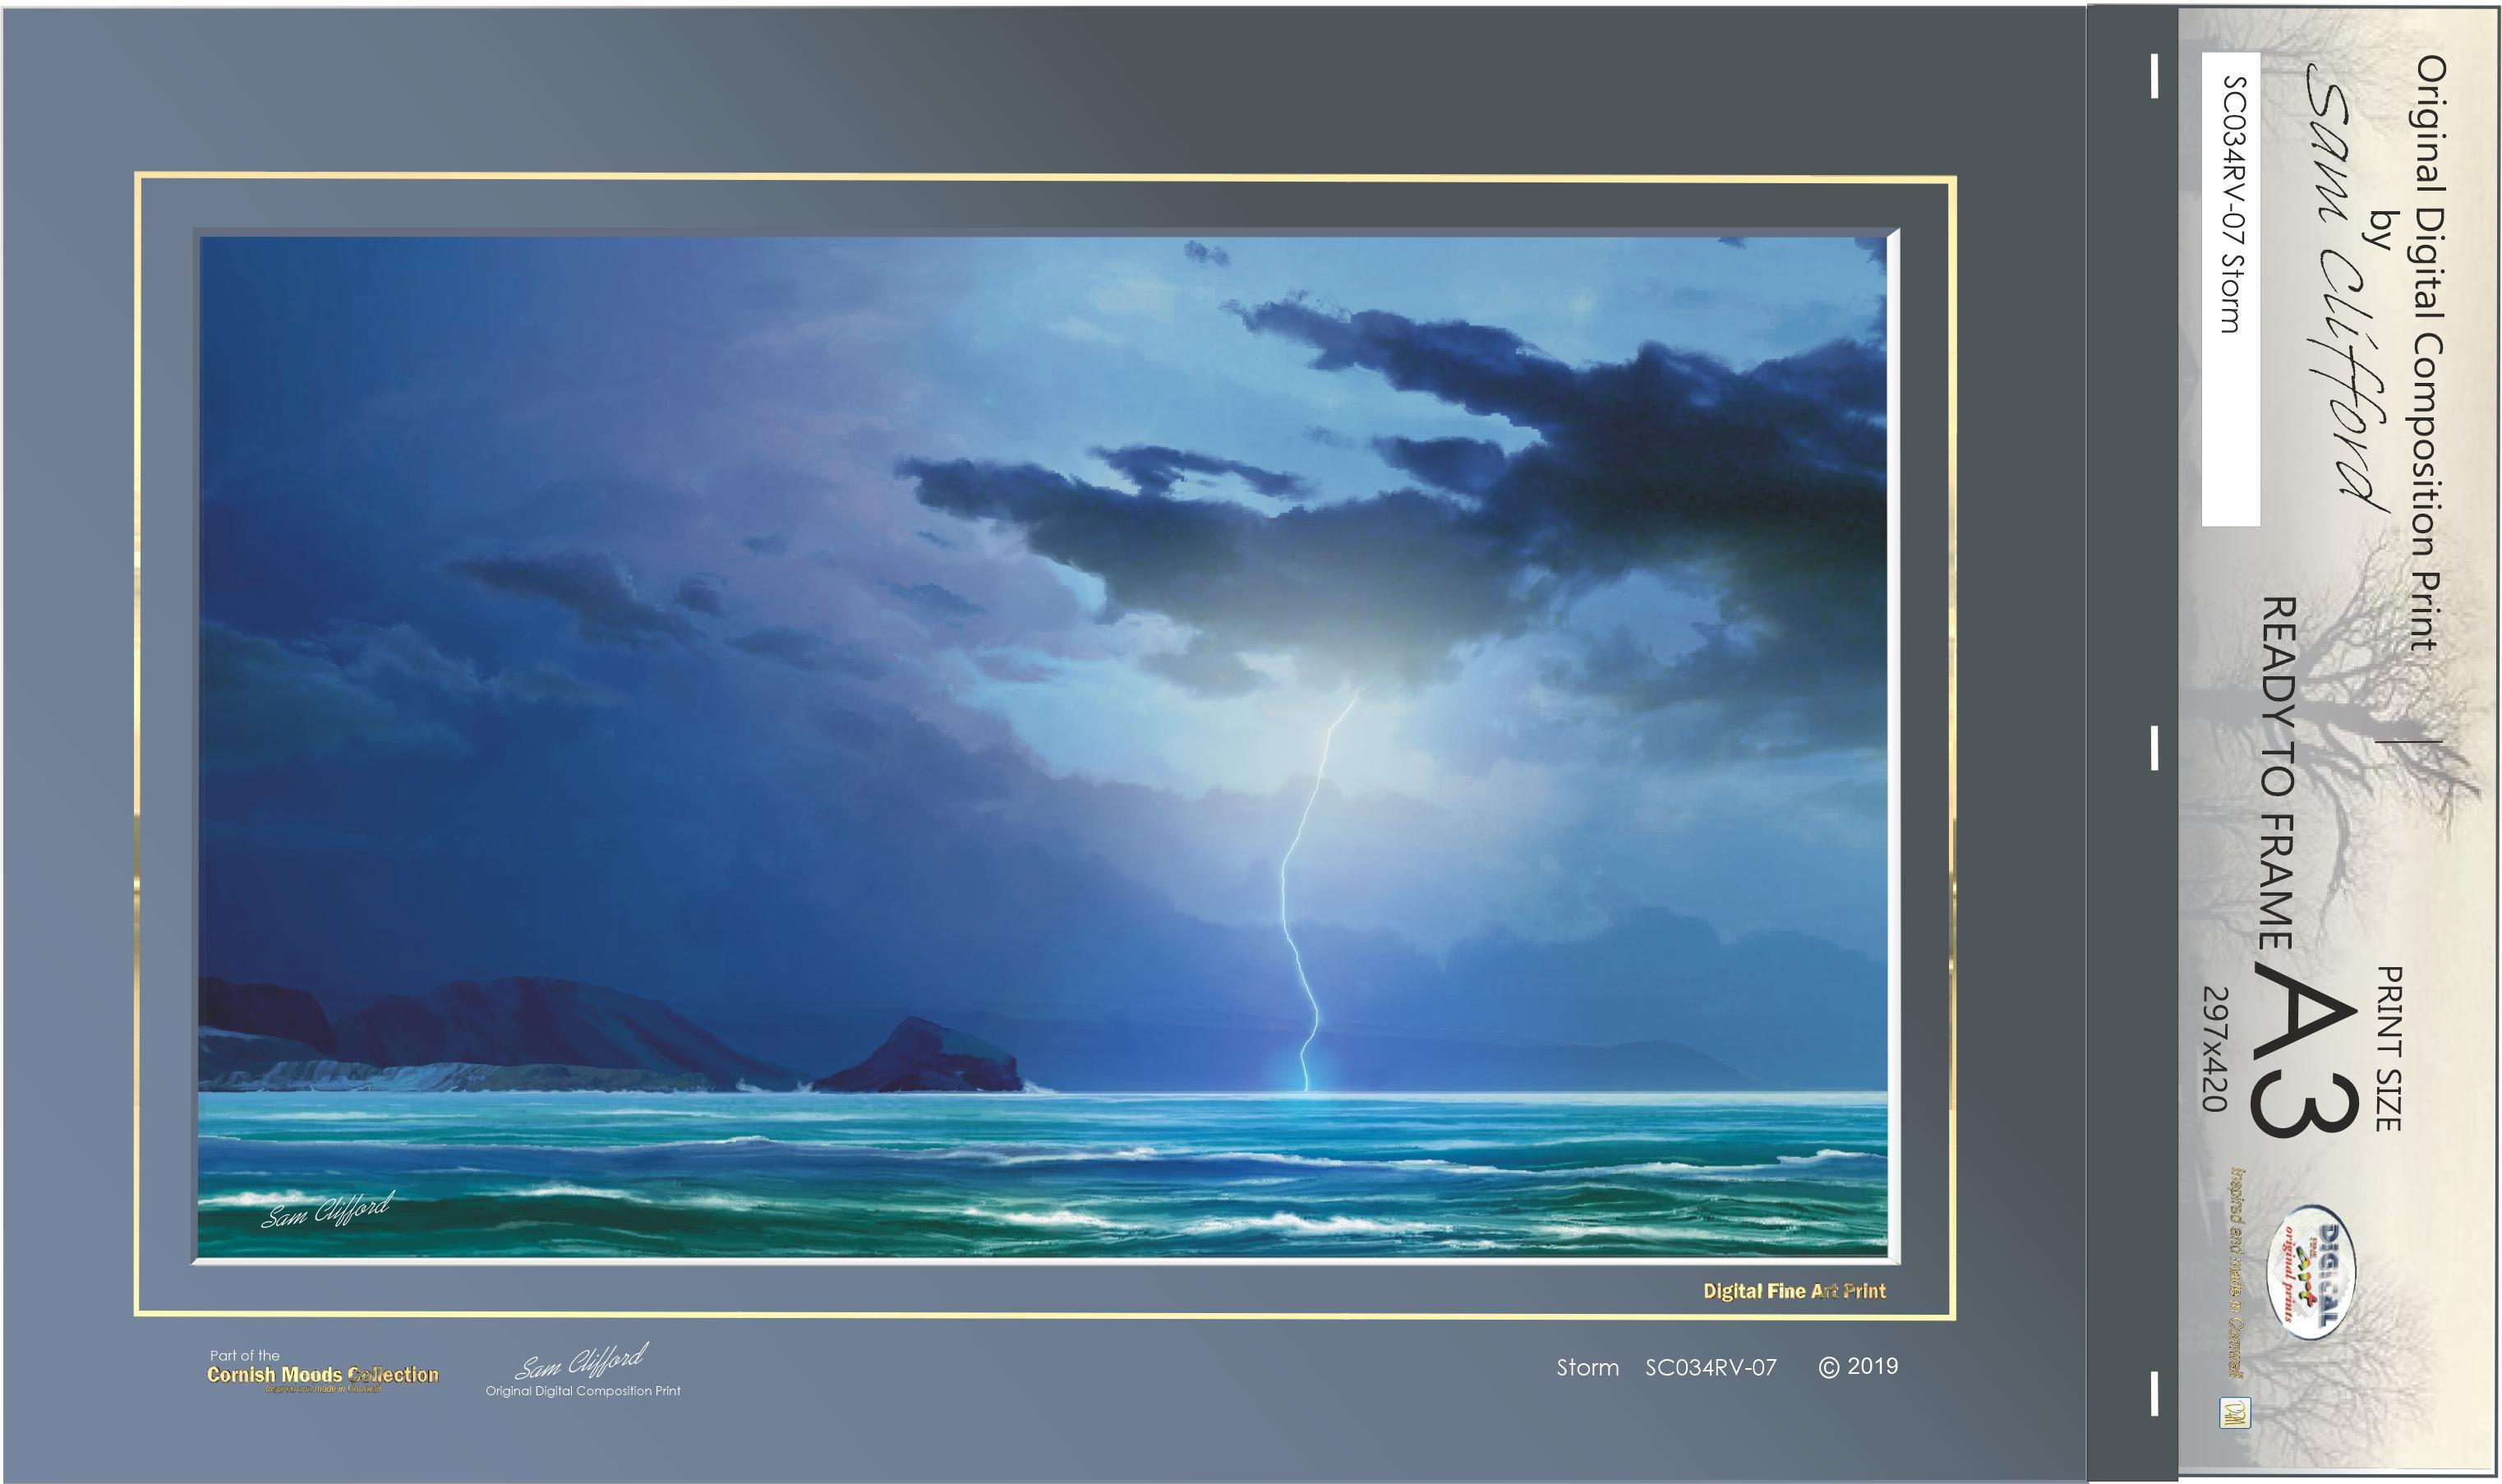 print code: Sc034RV-07  Storm